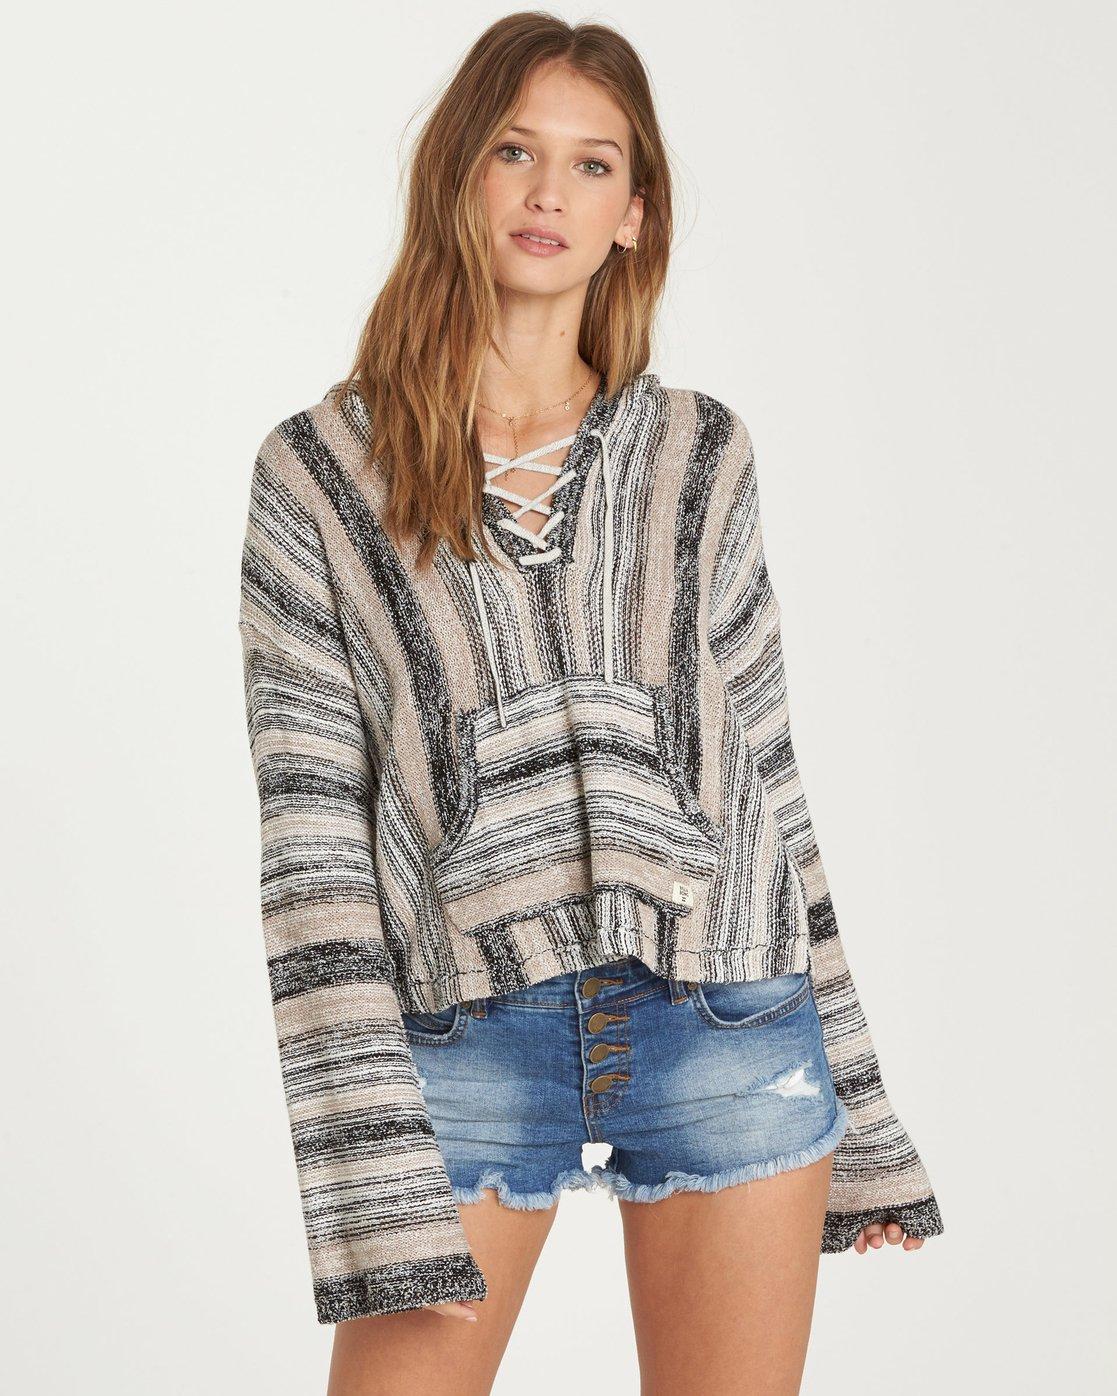 173956692e 0 Baja Beach Hooded Sweater JV14QBBA Billabong